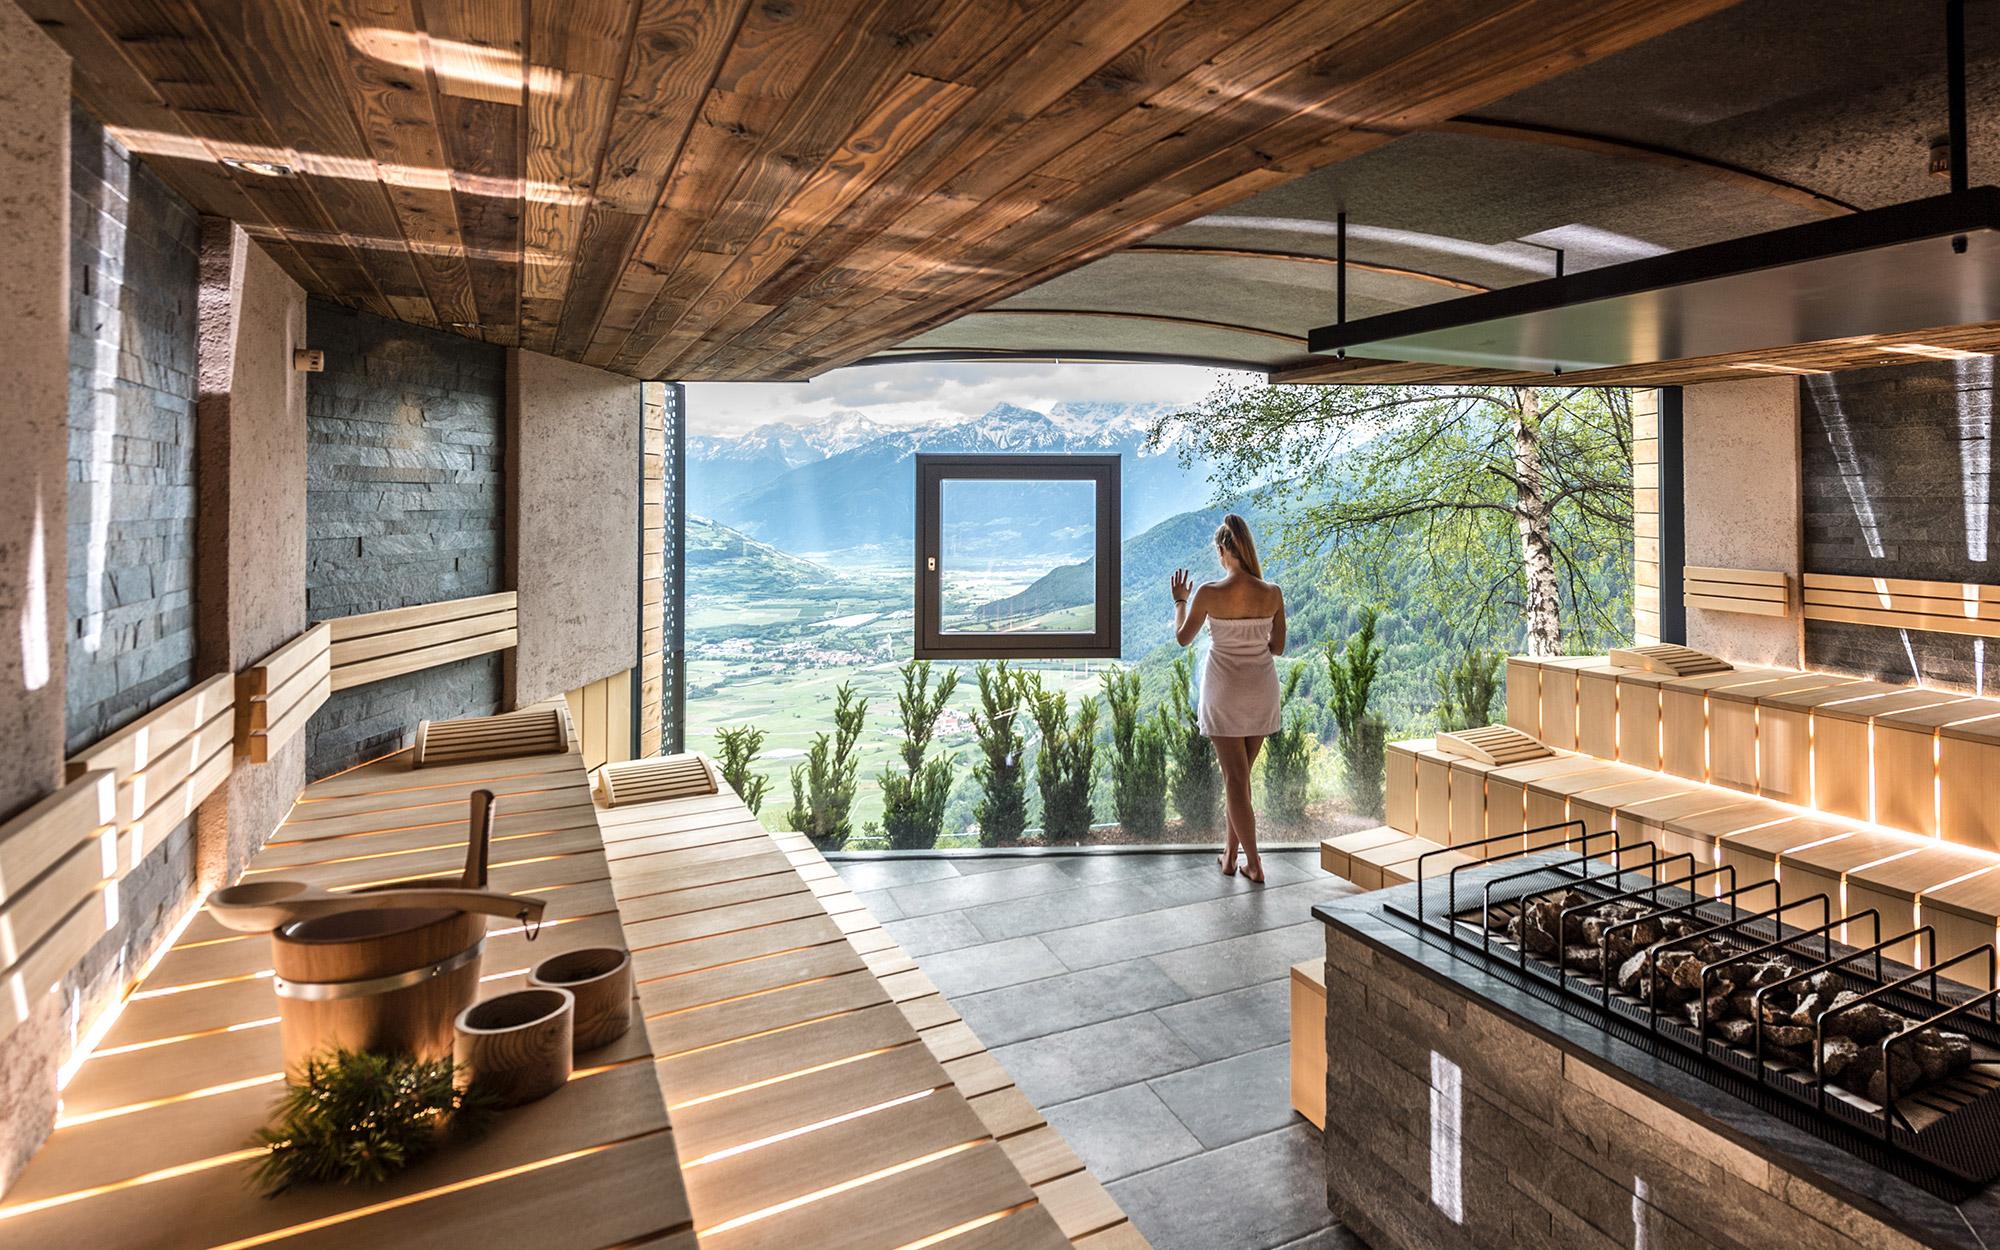 Vasca Da Bagno Translate : Alpin & relax hotel das gerstl news: novitÀ da inverno 2017